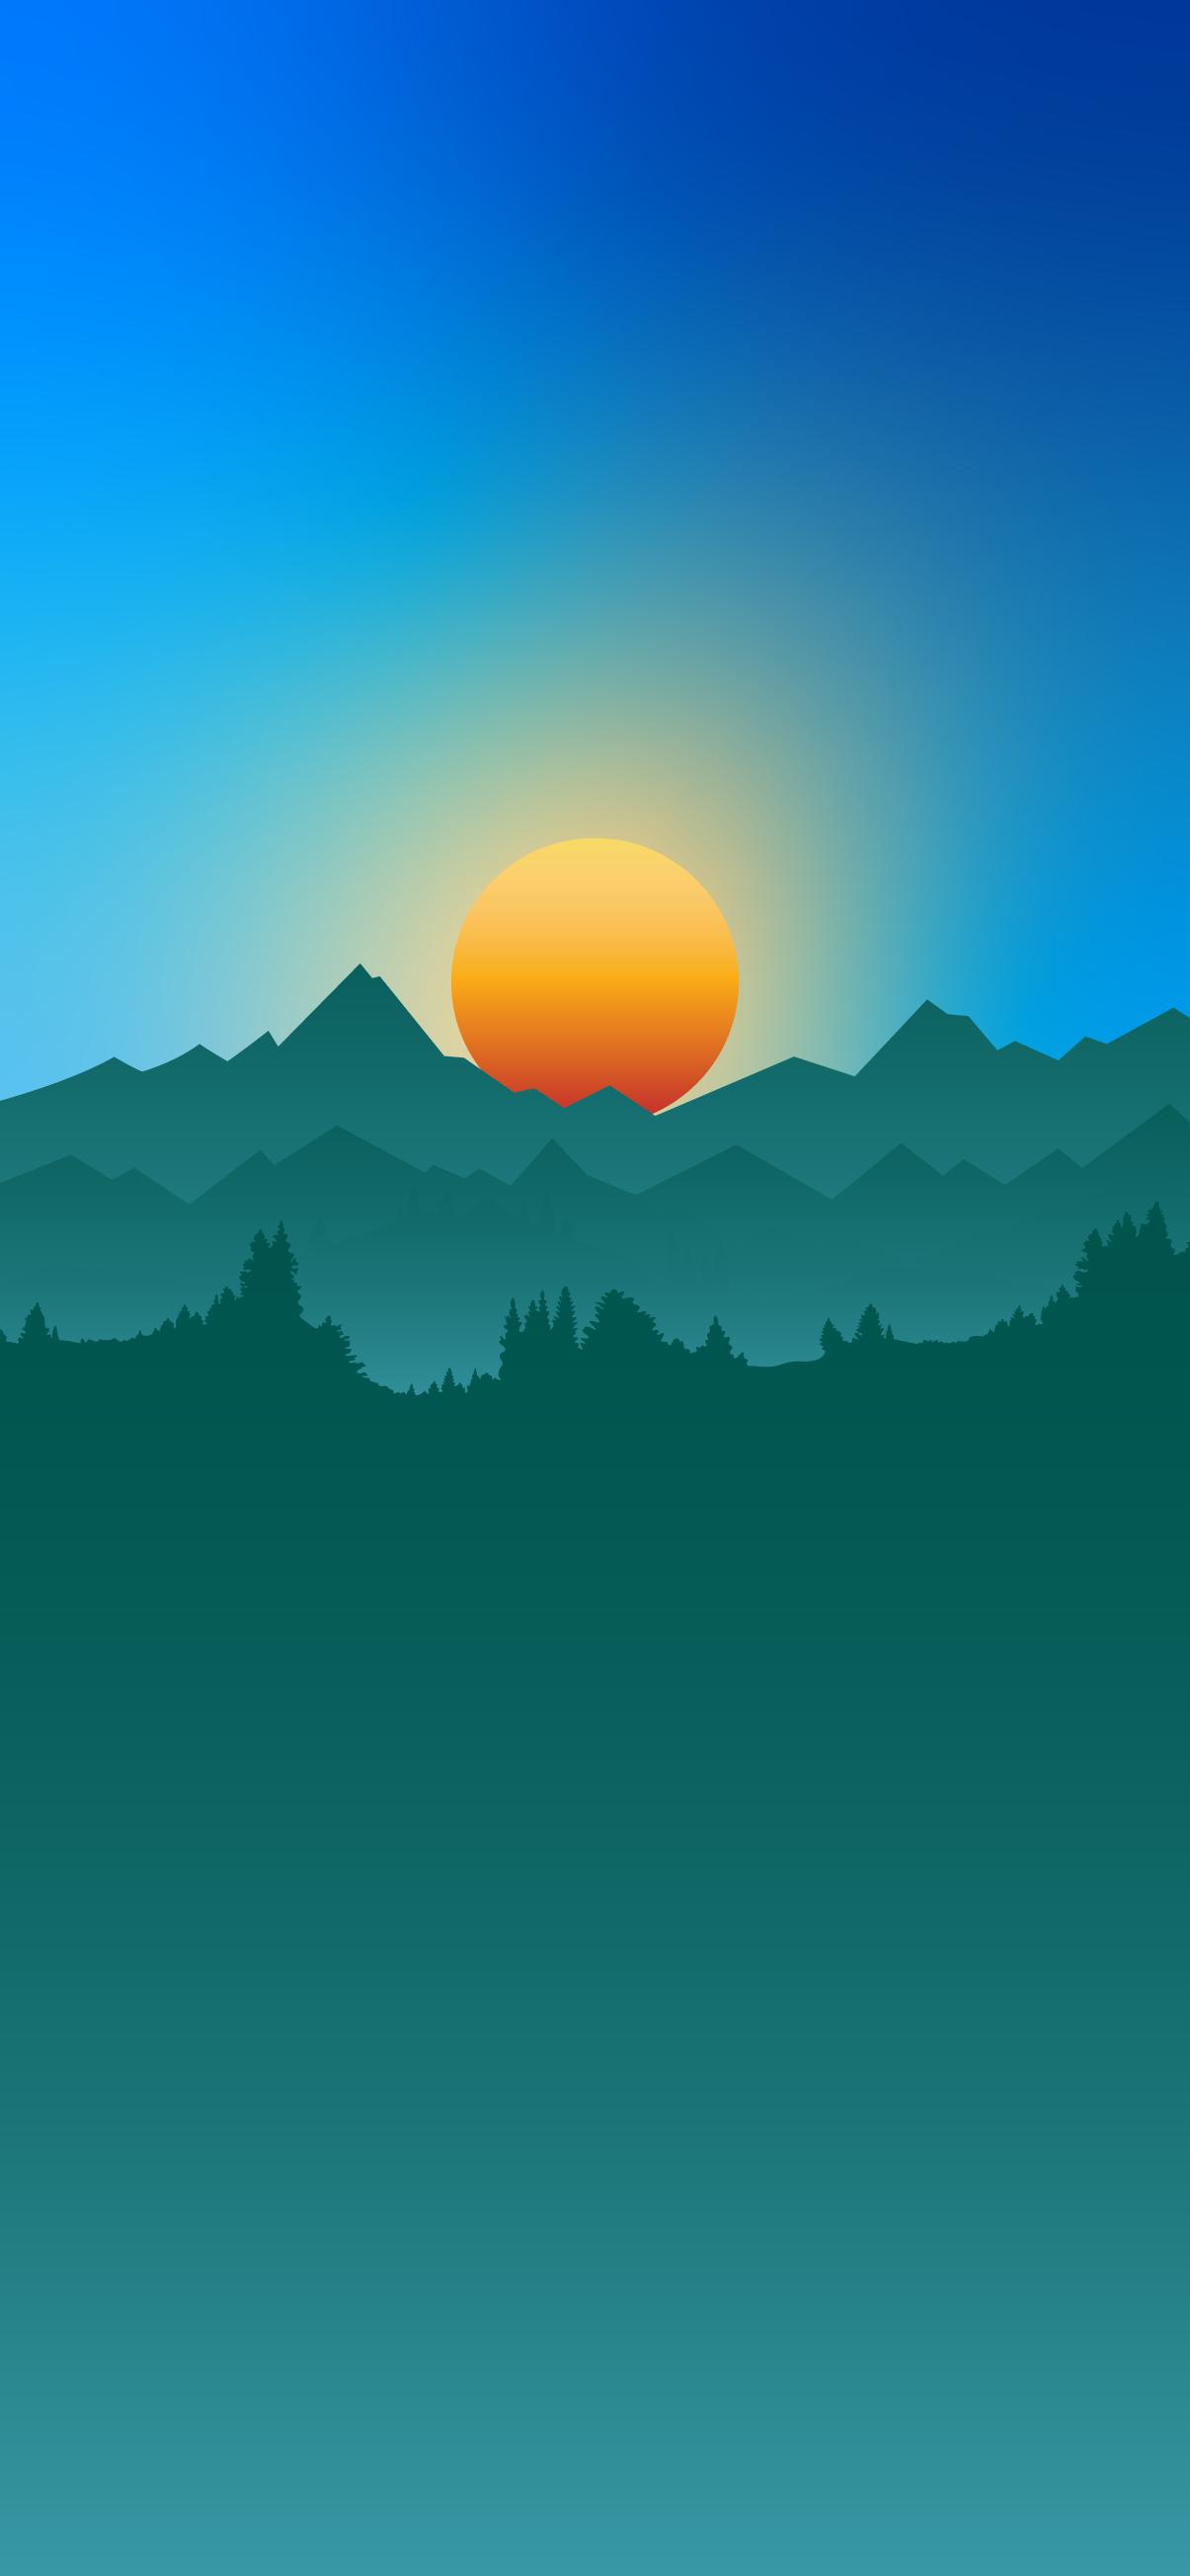 beautiful-landscape-phone-wallpaper-hd-4k